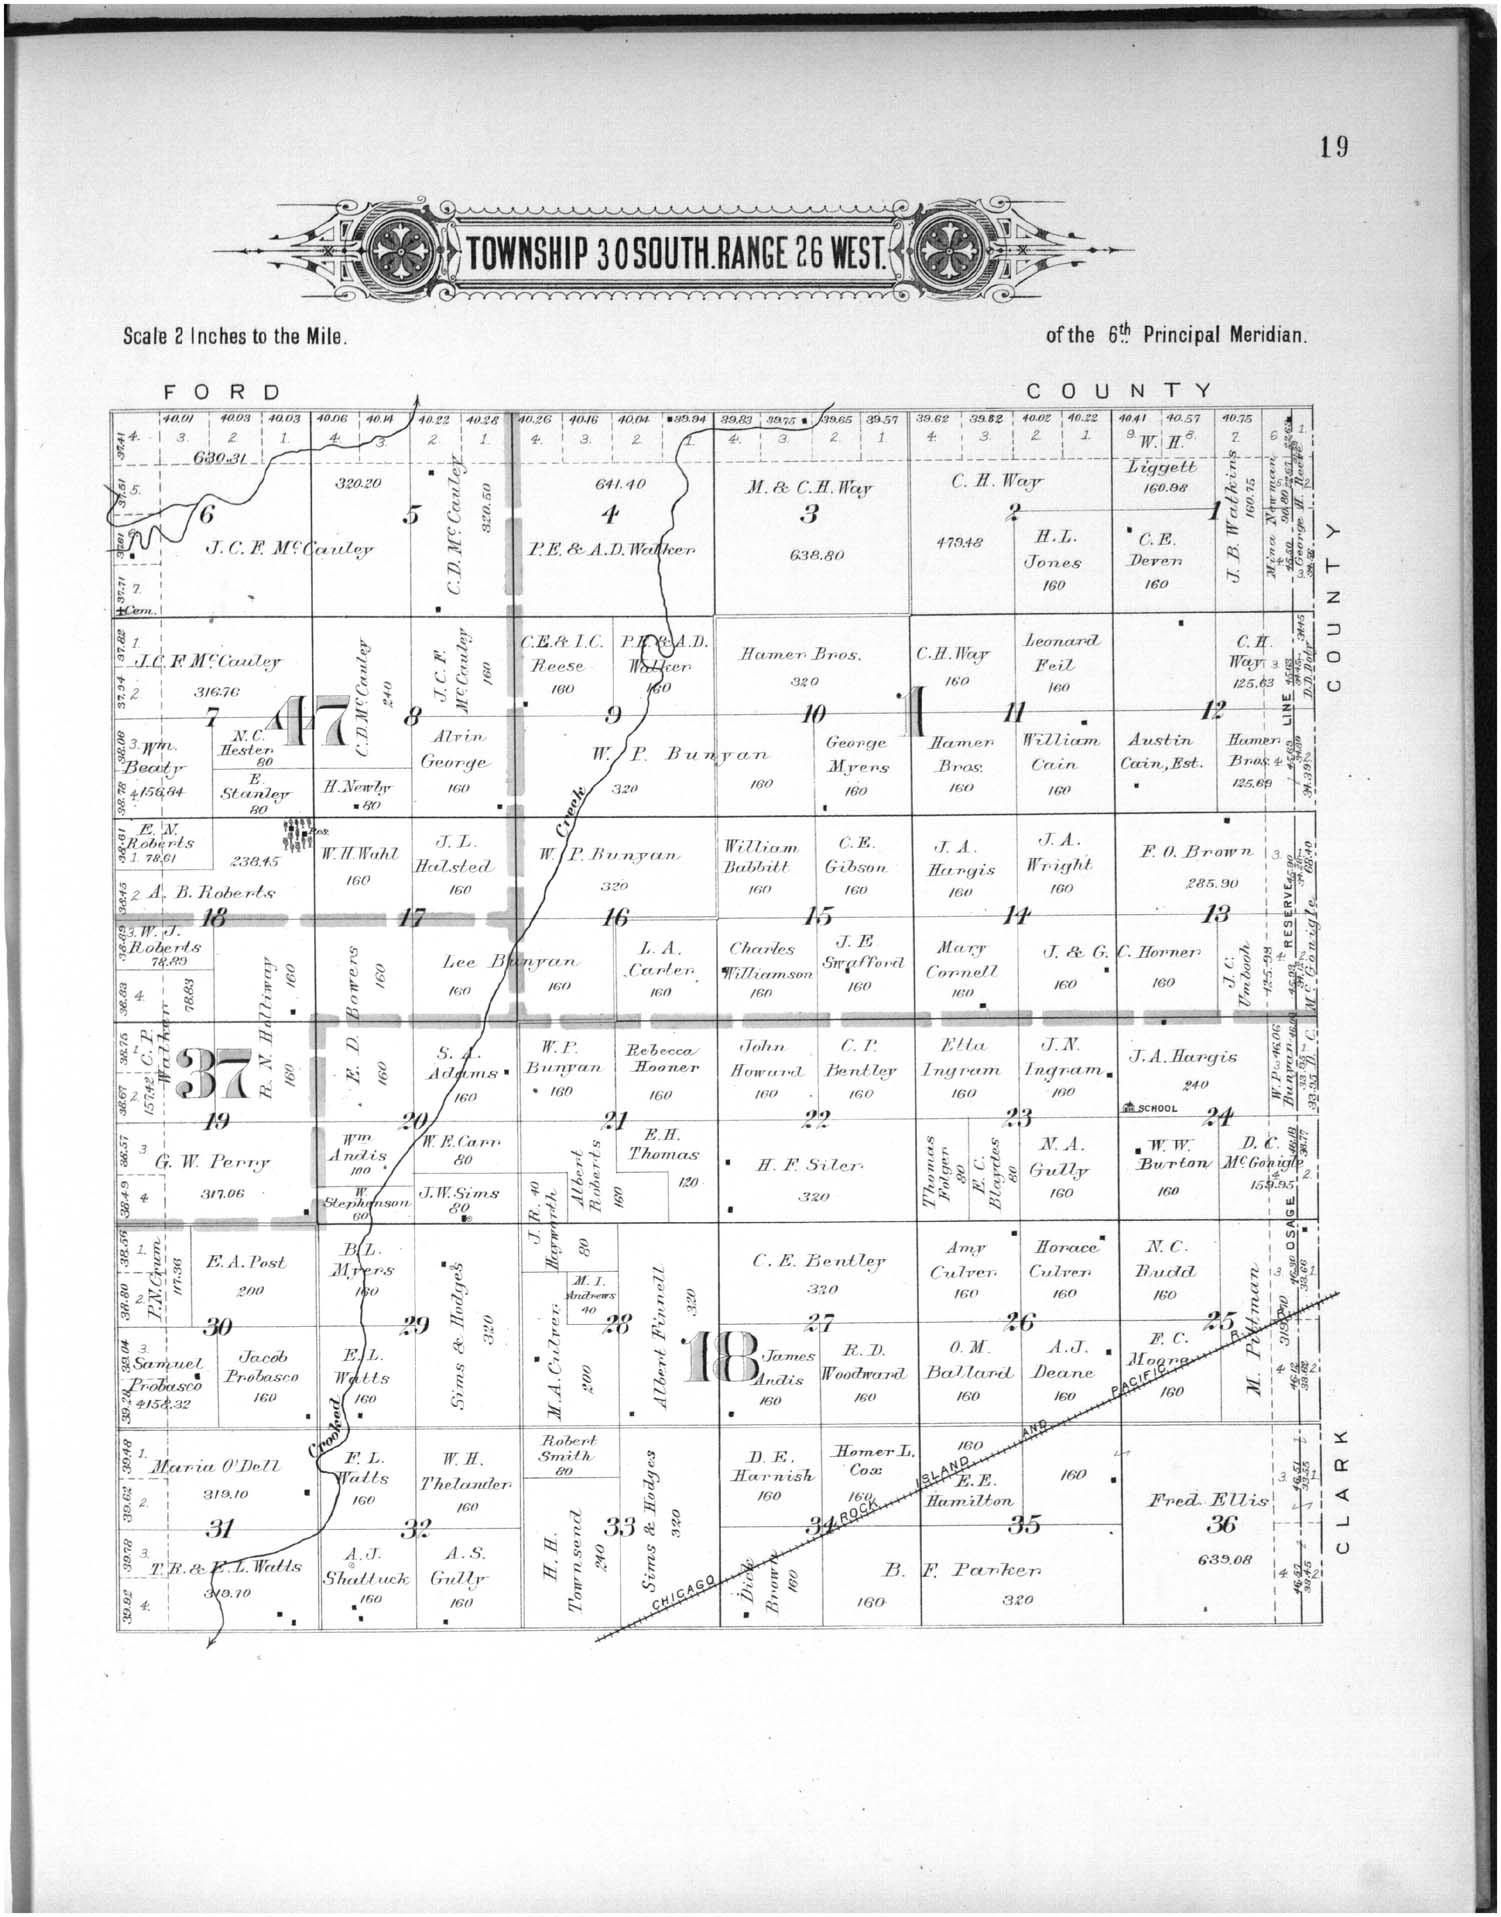 Plat book of Meade County, Kansas - 19